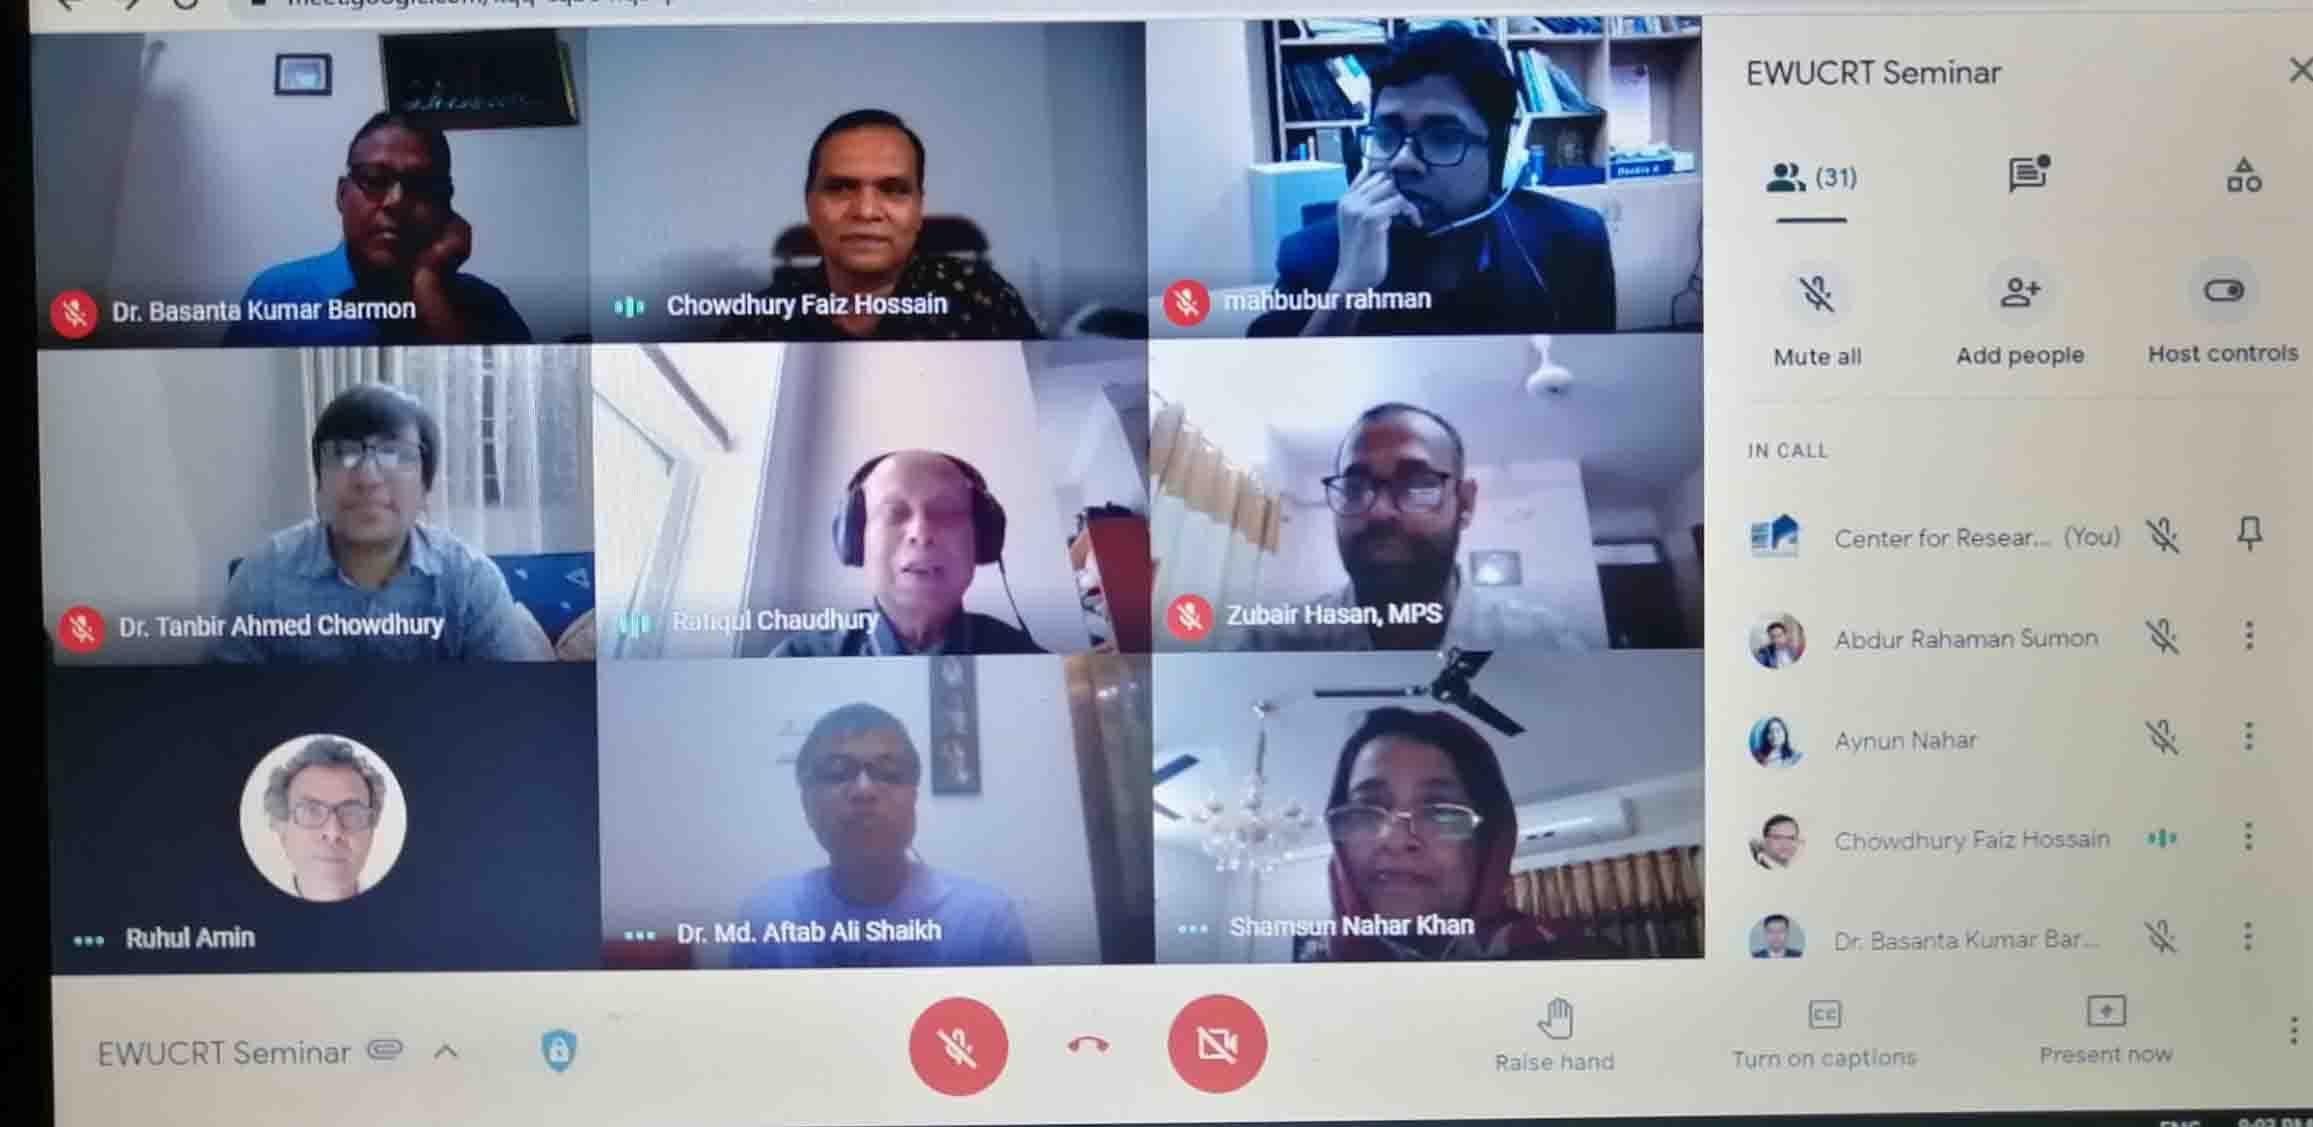 EWU-CRT Arranges a Research Seminar